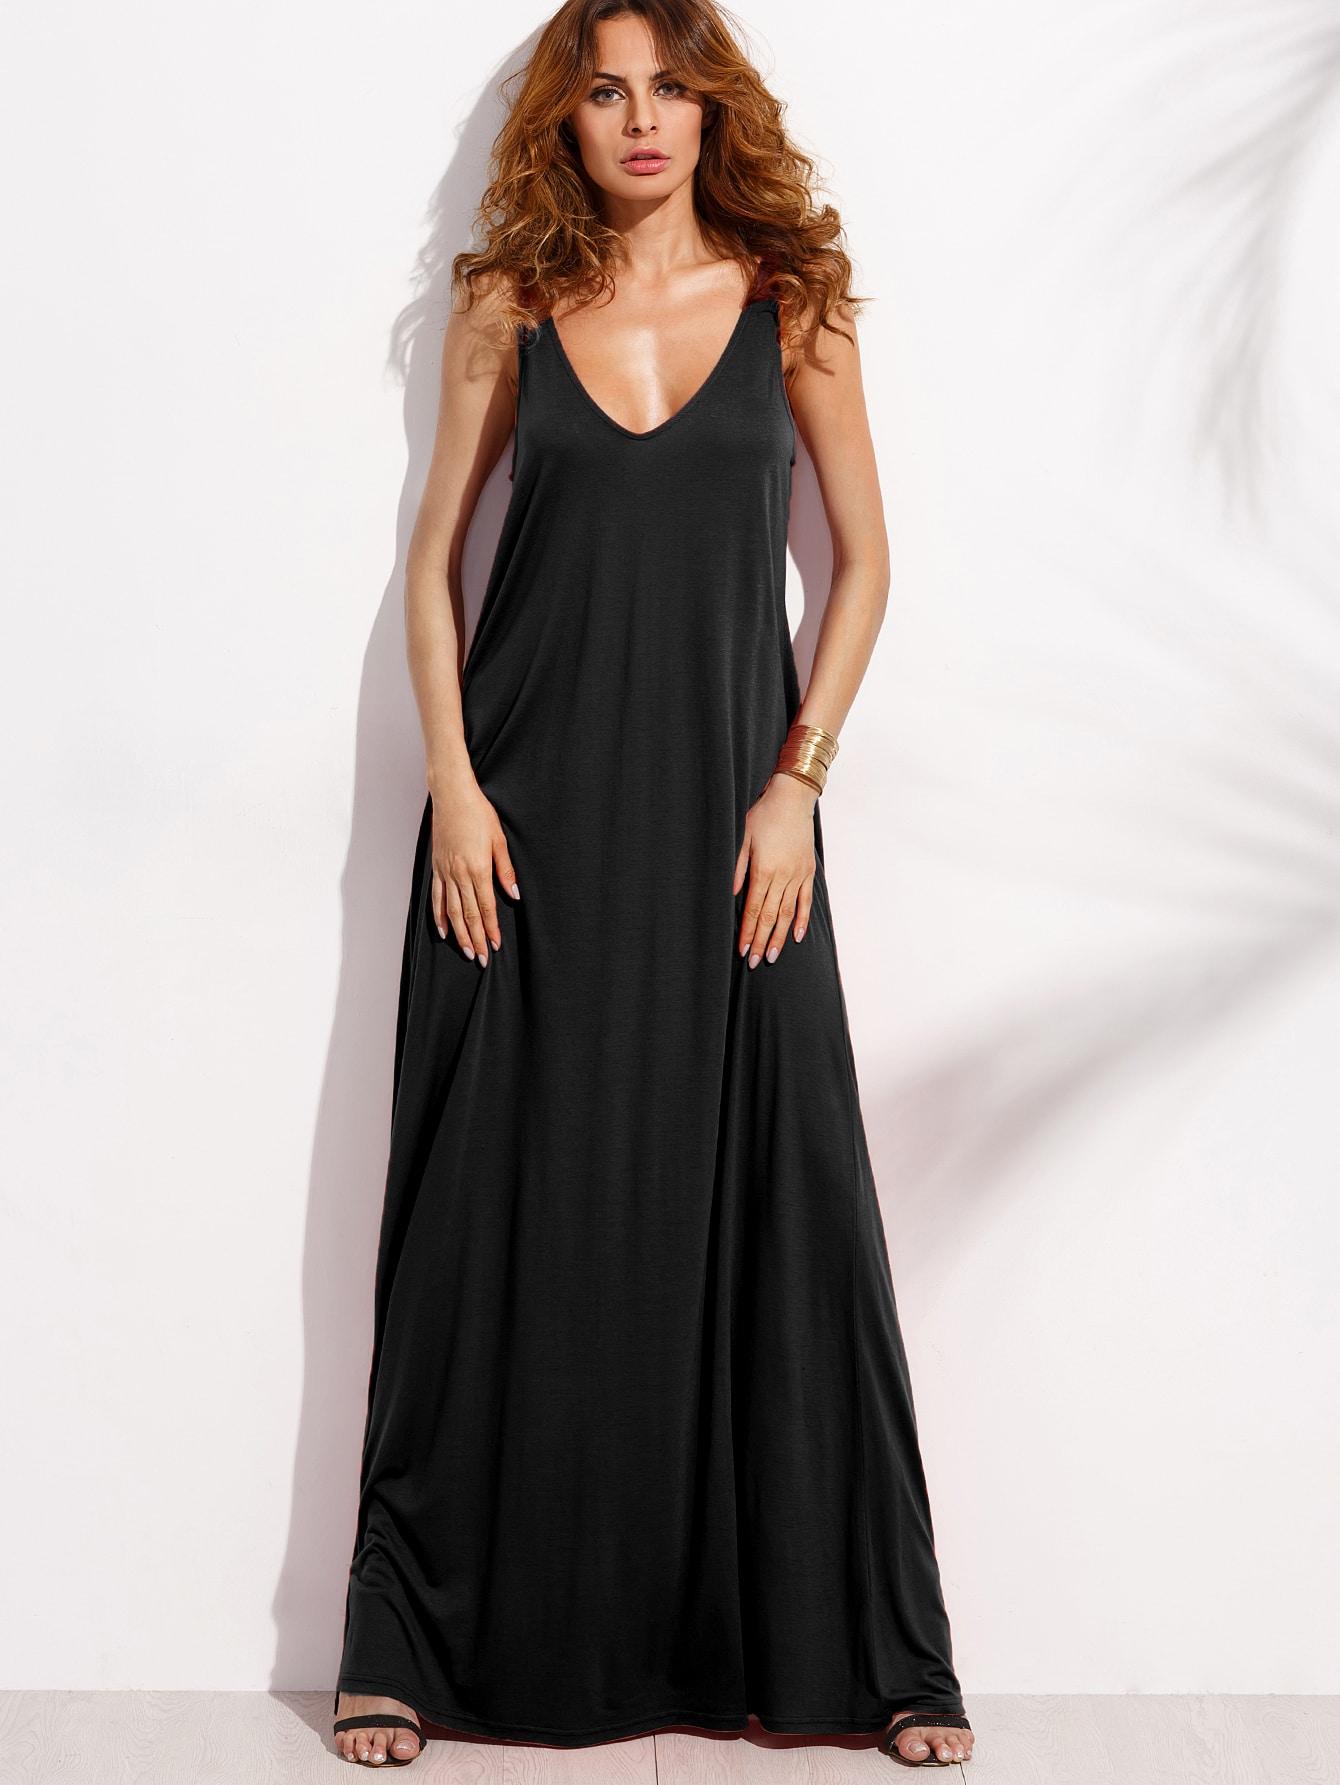 Black Double V Neck Sleeveless Maxi Tent Dress pictures  sc 1 st  EmmaCloth & Black Double V Neck Sleeveless Maxi Tent Dress EmmaCloth-Women ...